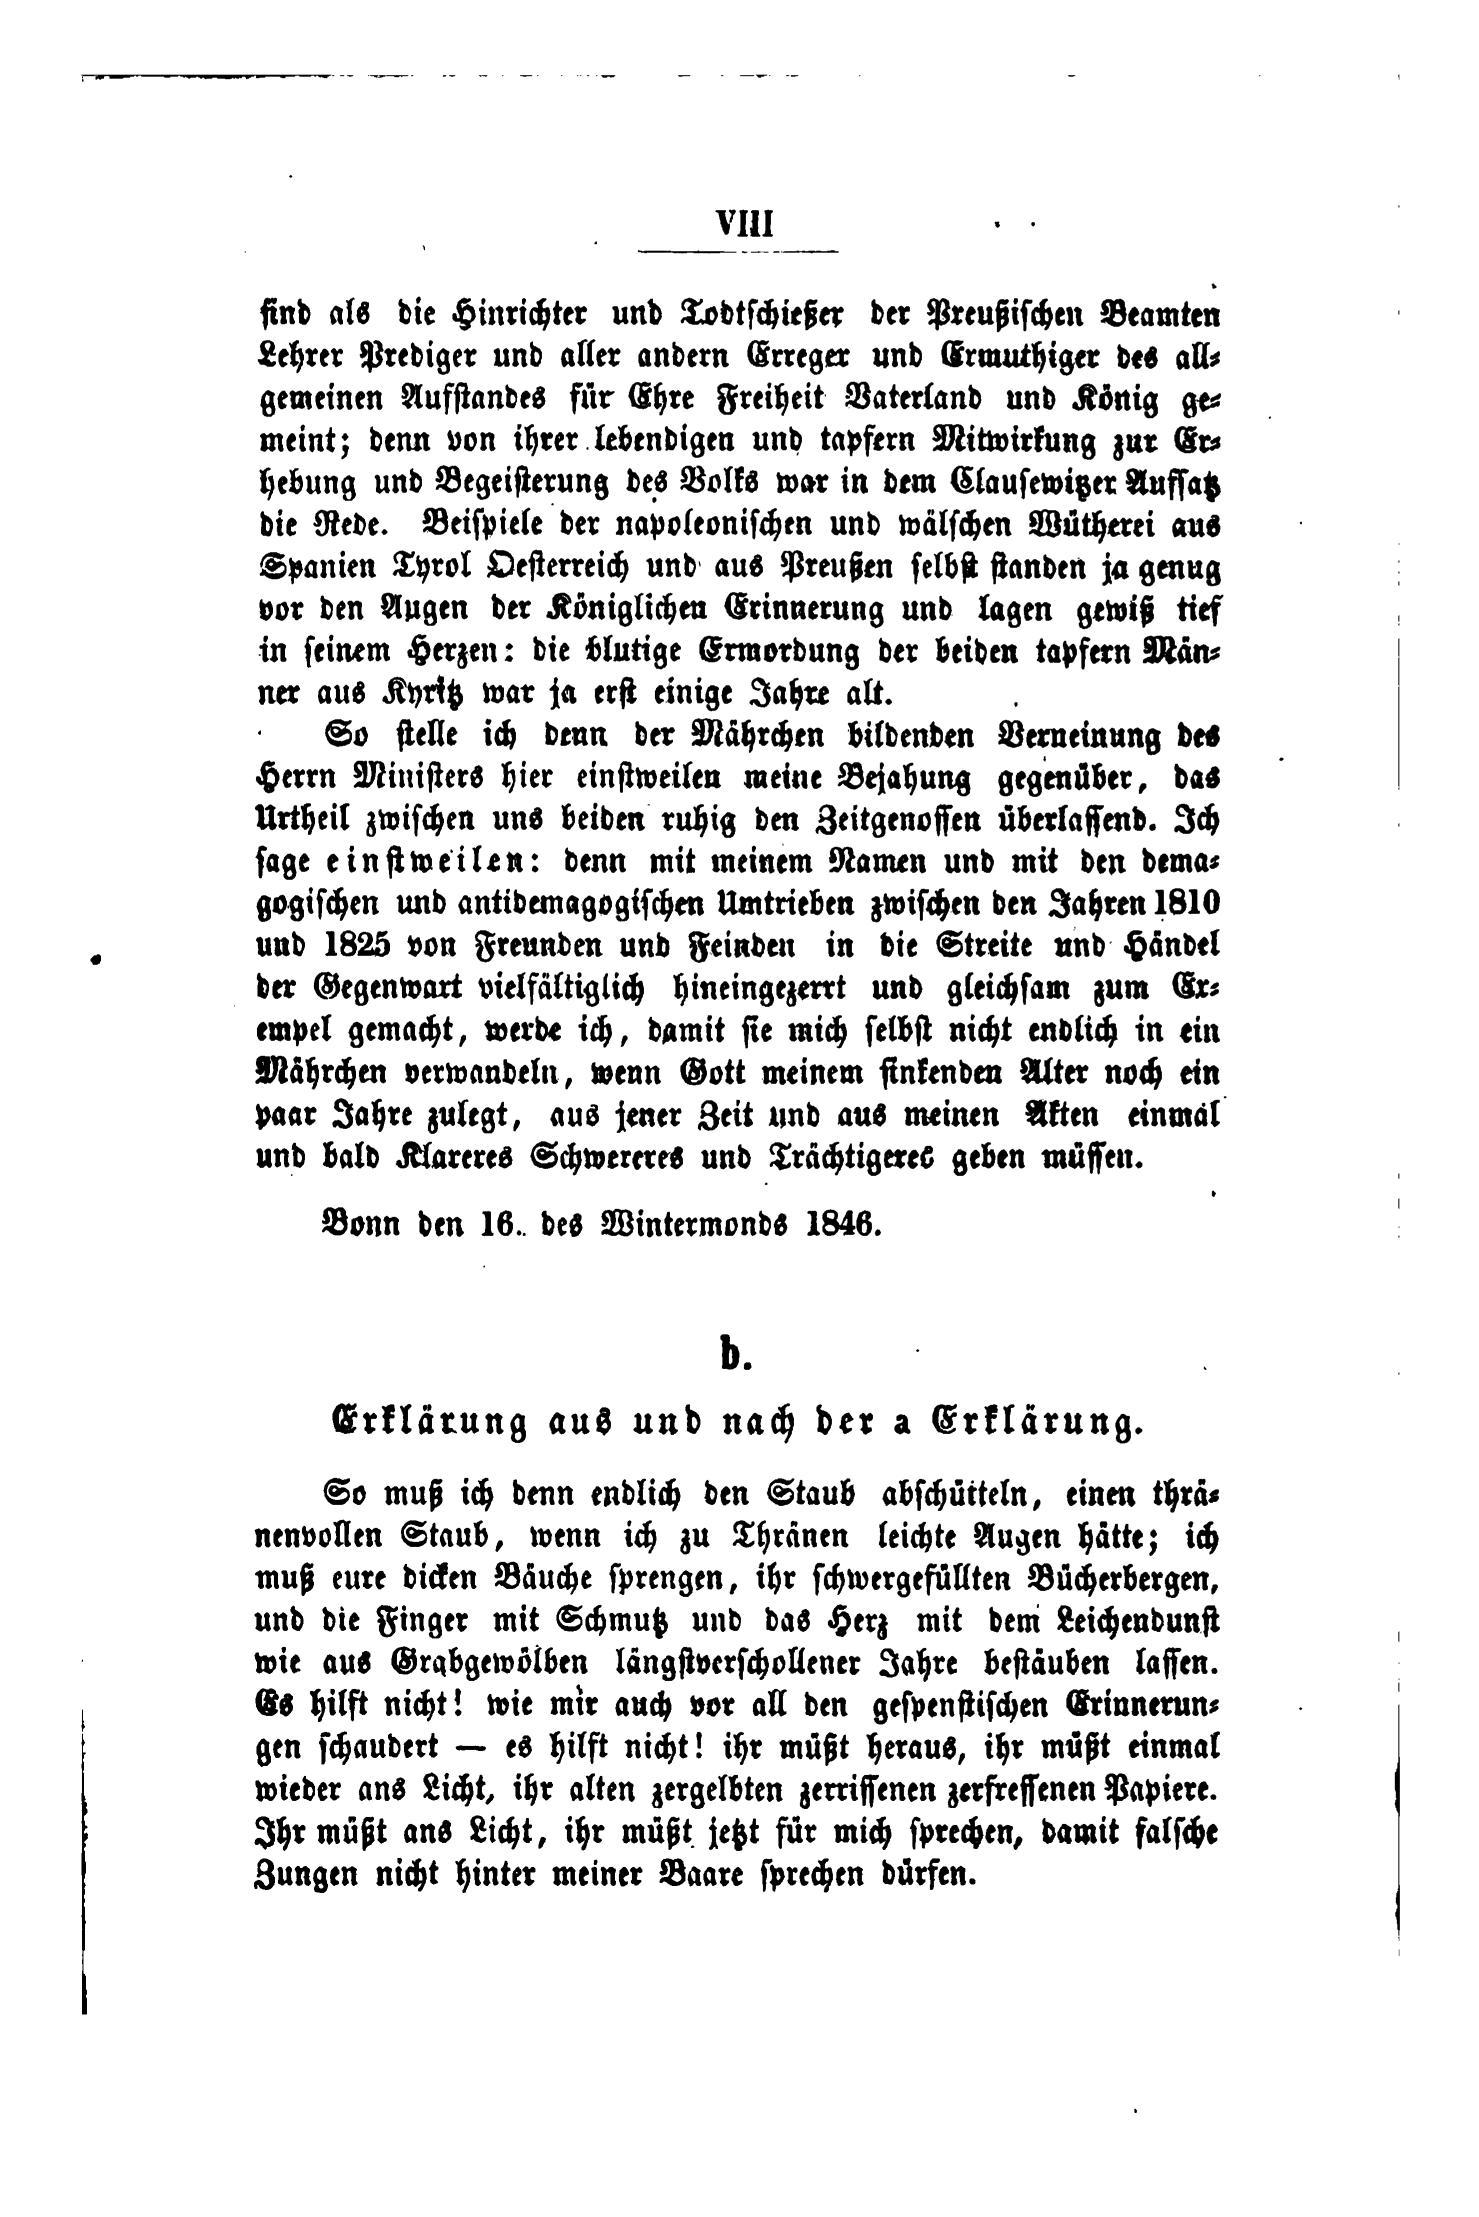 File:De Bericht aus seinem Leben (Arndt) 011.jpg - Wikimedia Commons